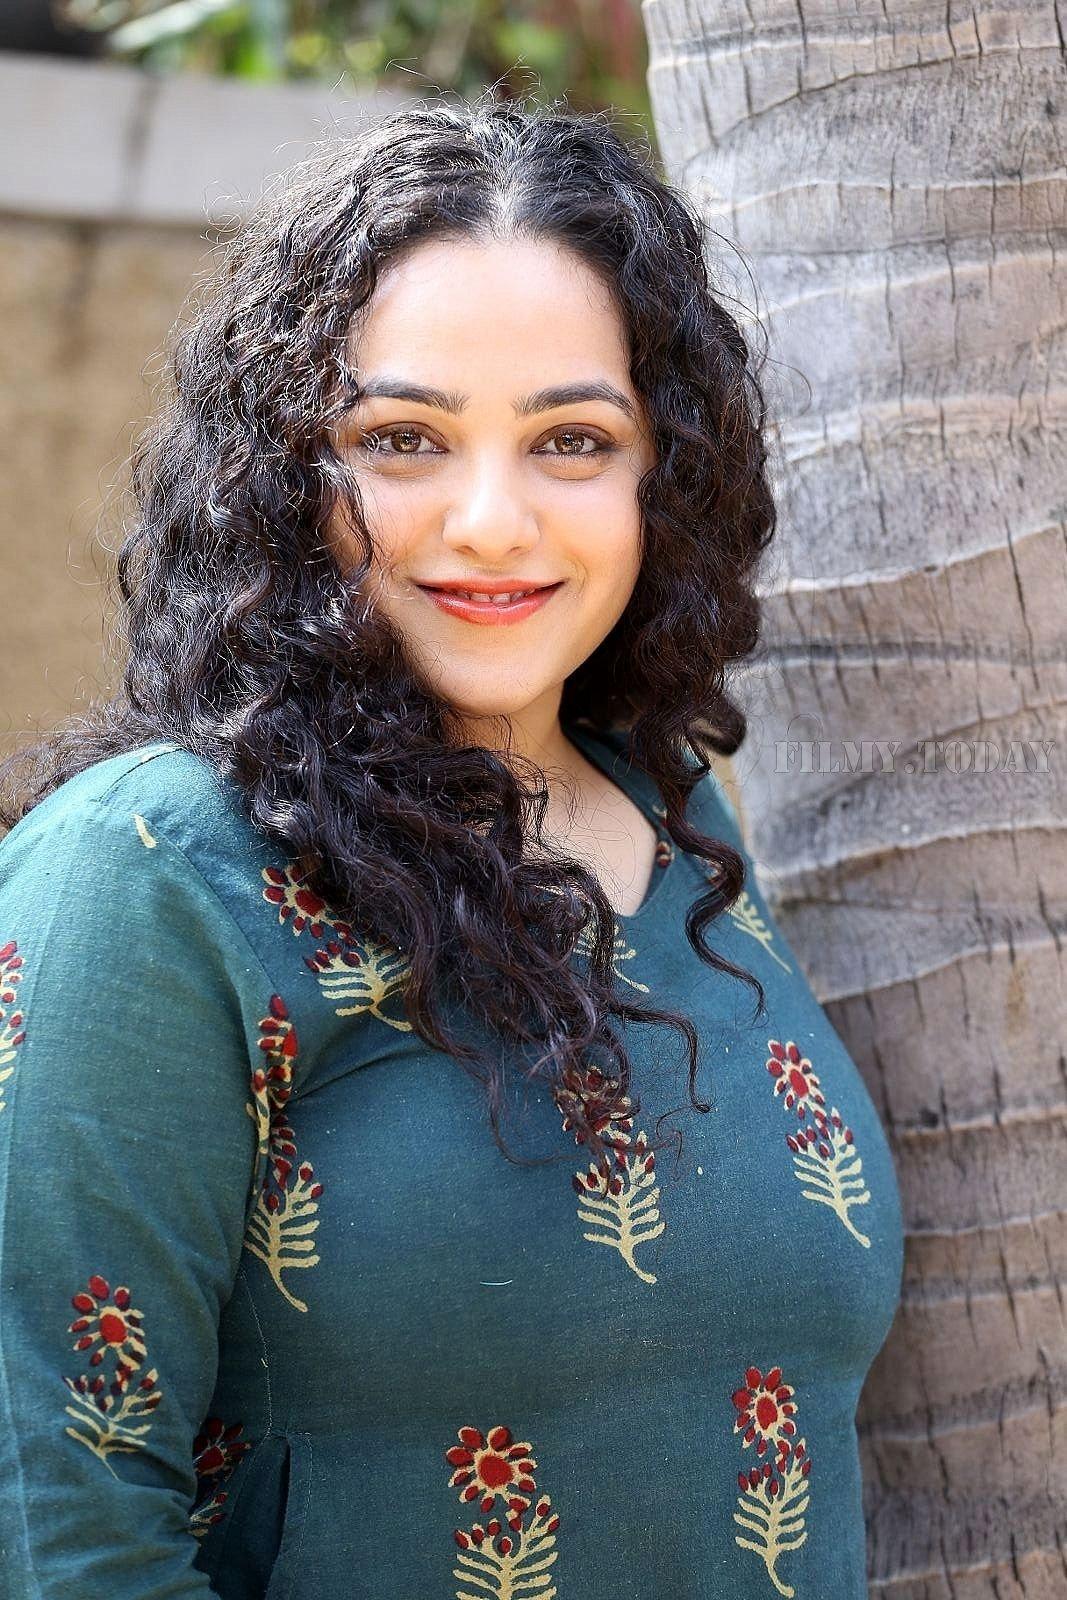 actress nithya menen interview about awe telugu movie photos | page